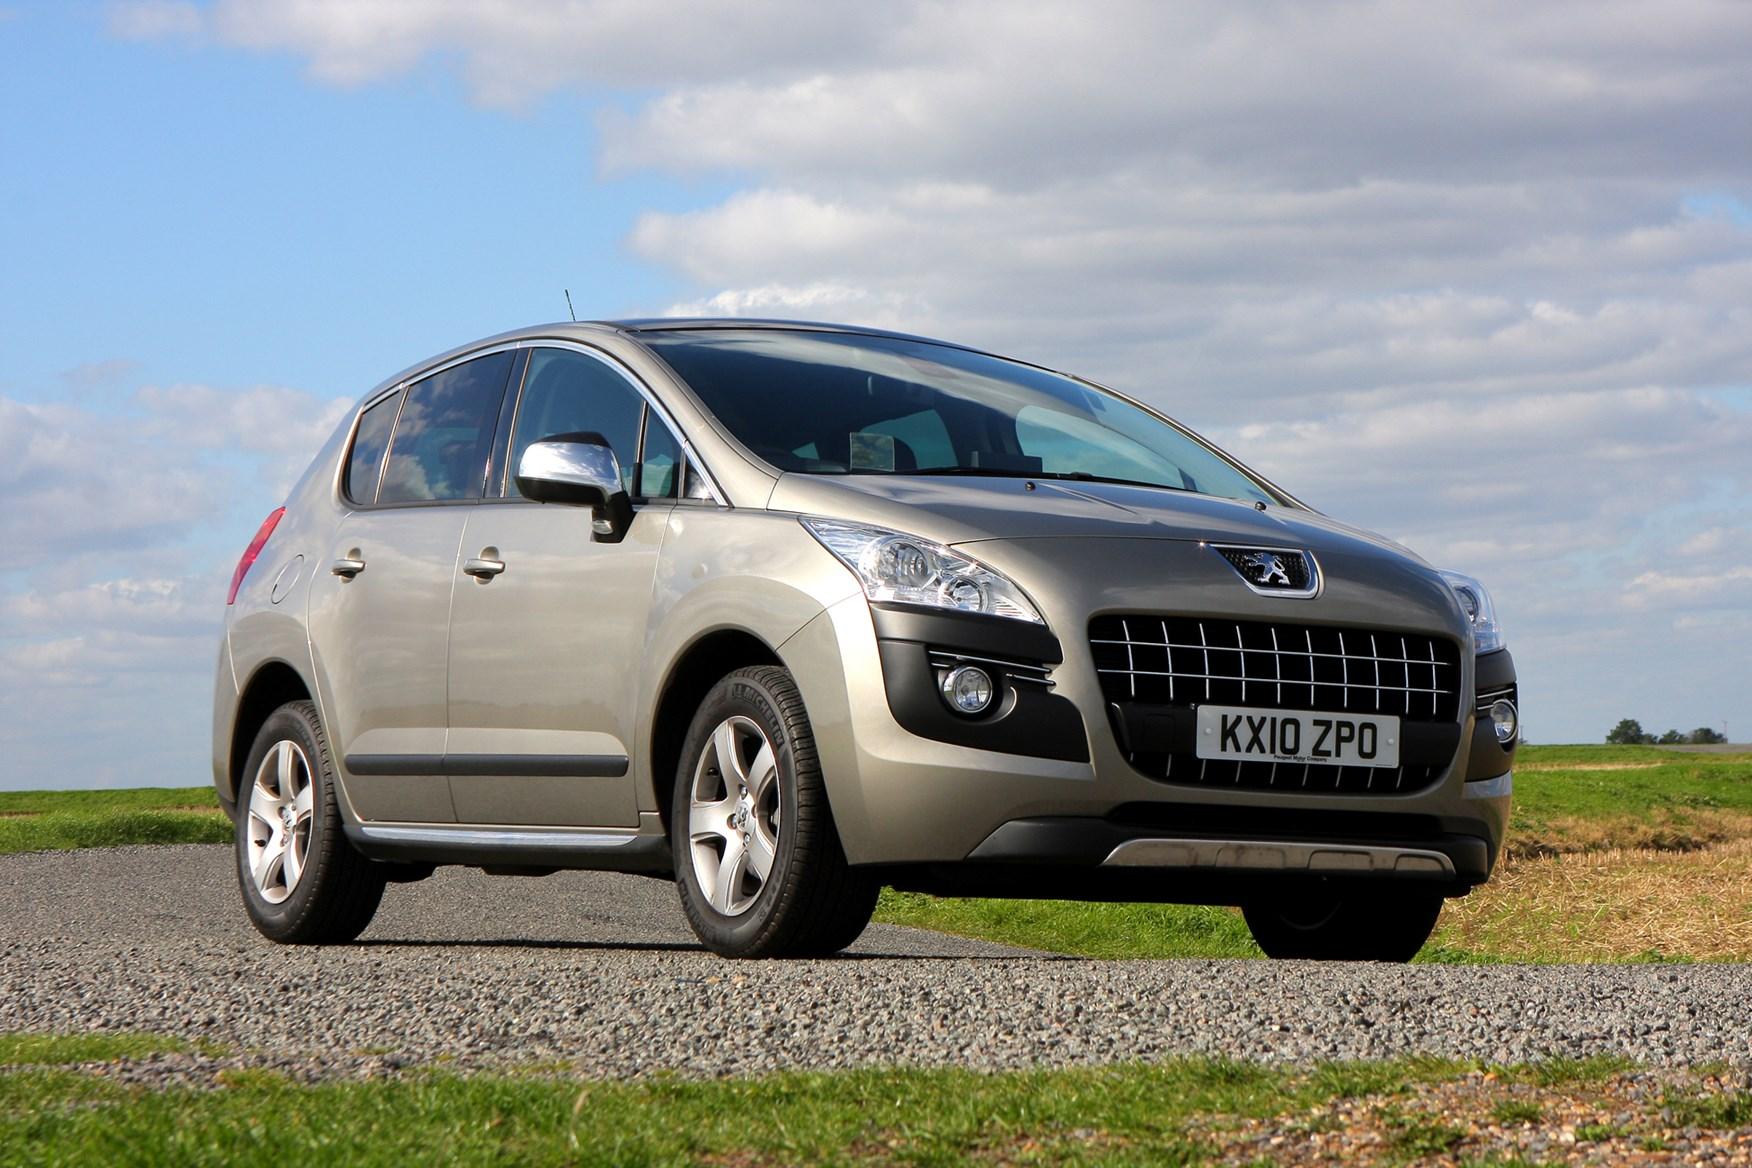 Peugeot 3008 I Restyling 2013 - 2016 SUV 5 door :: OUTSTANDING CARS